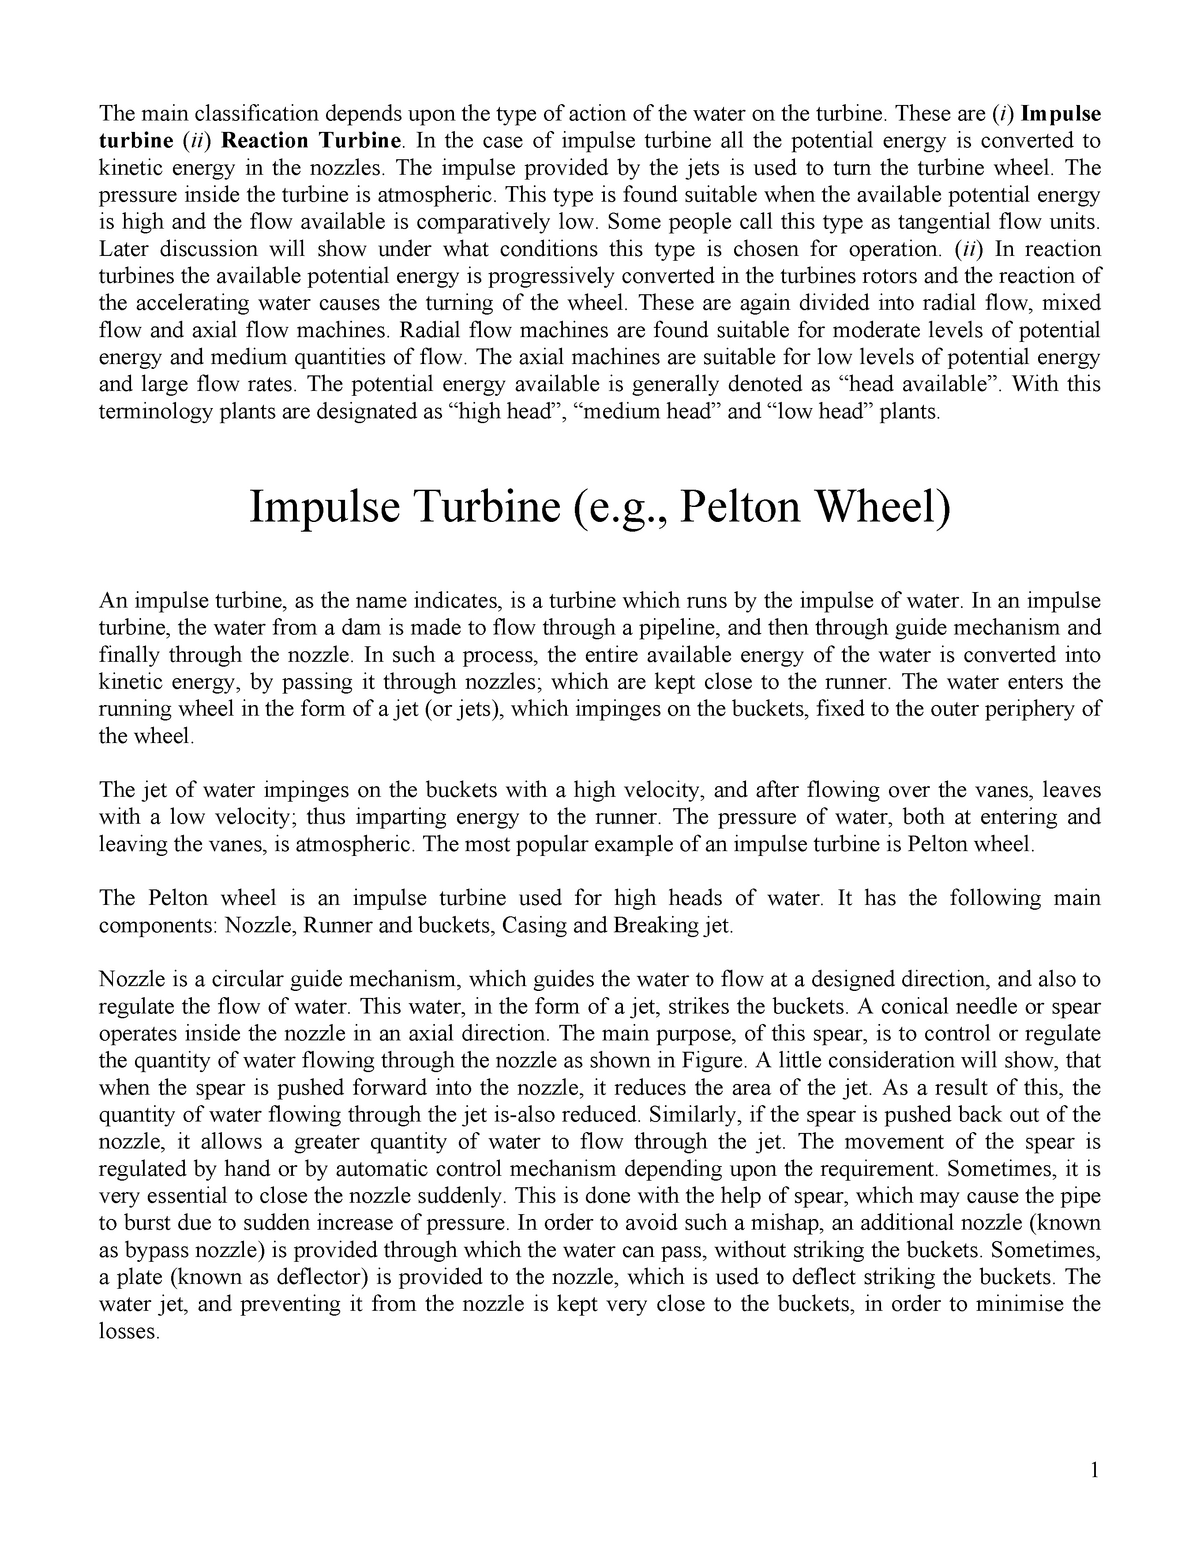 Applied Fluids and Thermodynamics Impulse Turbine, 6 lecture